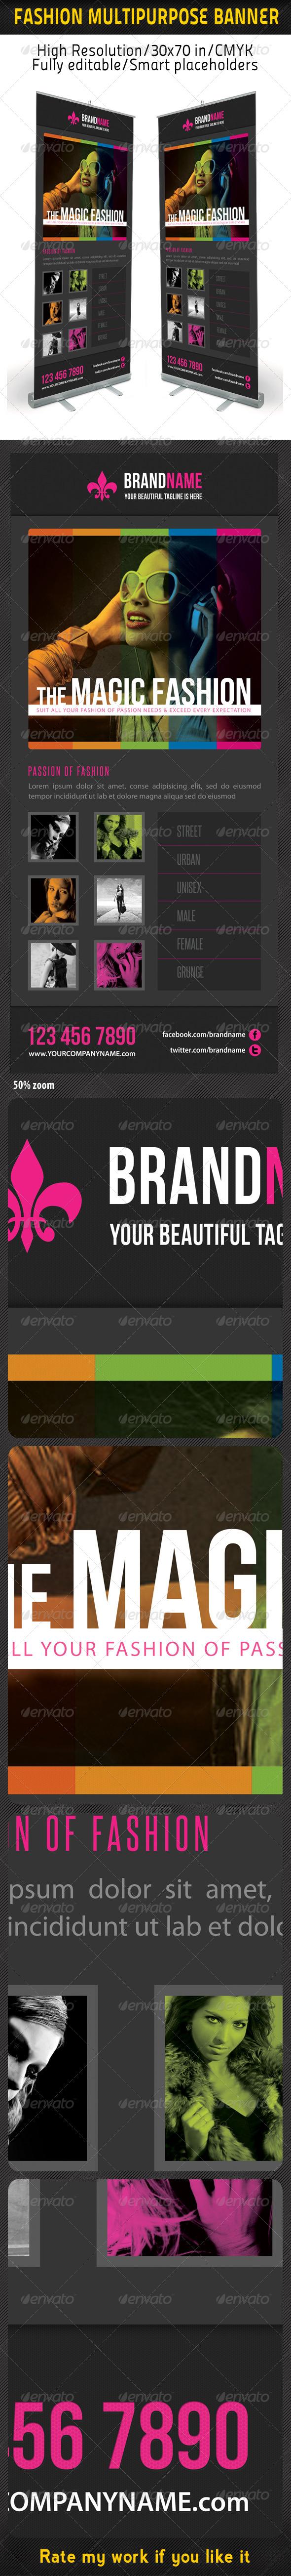 Fashion Multipurpose Banner Template 16 - Signage Print Templates